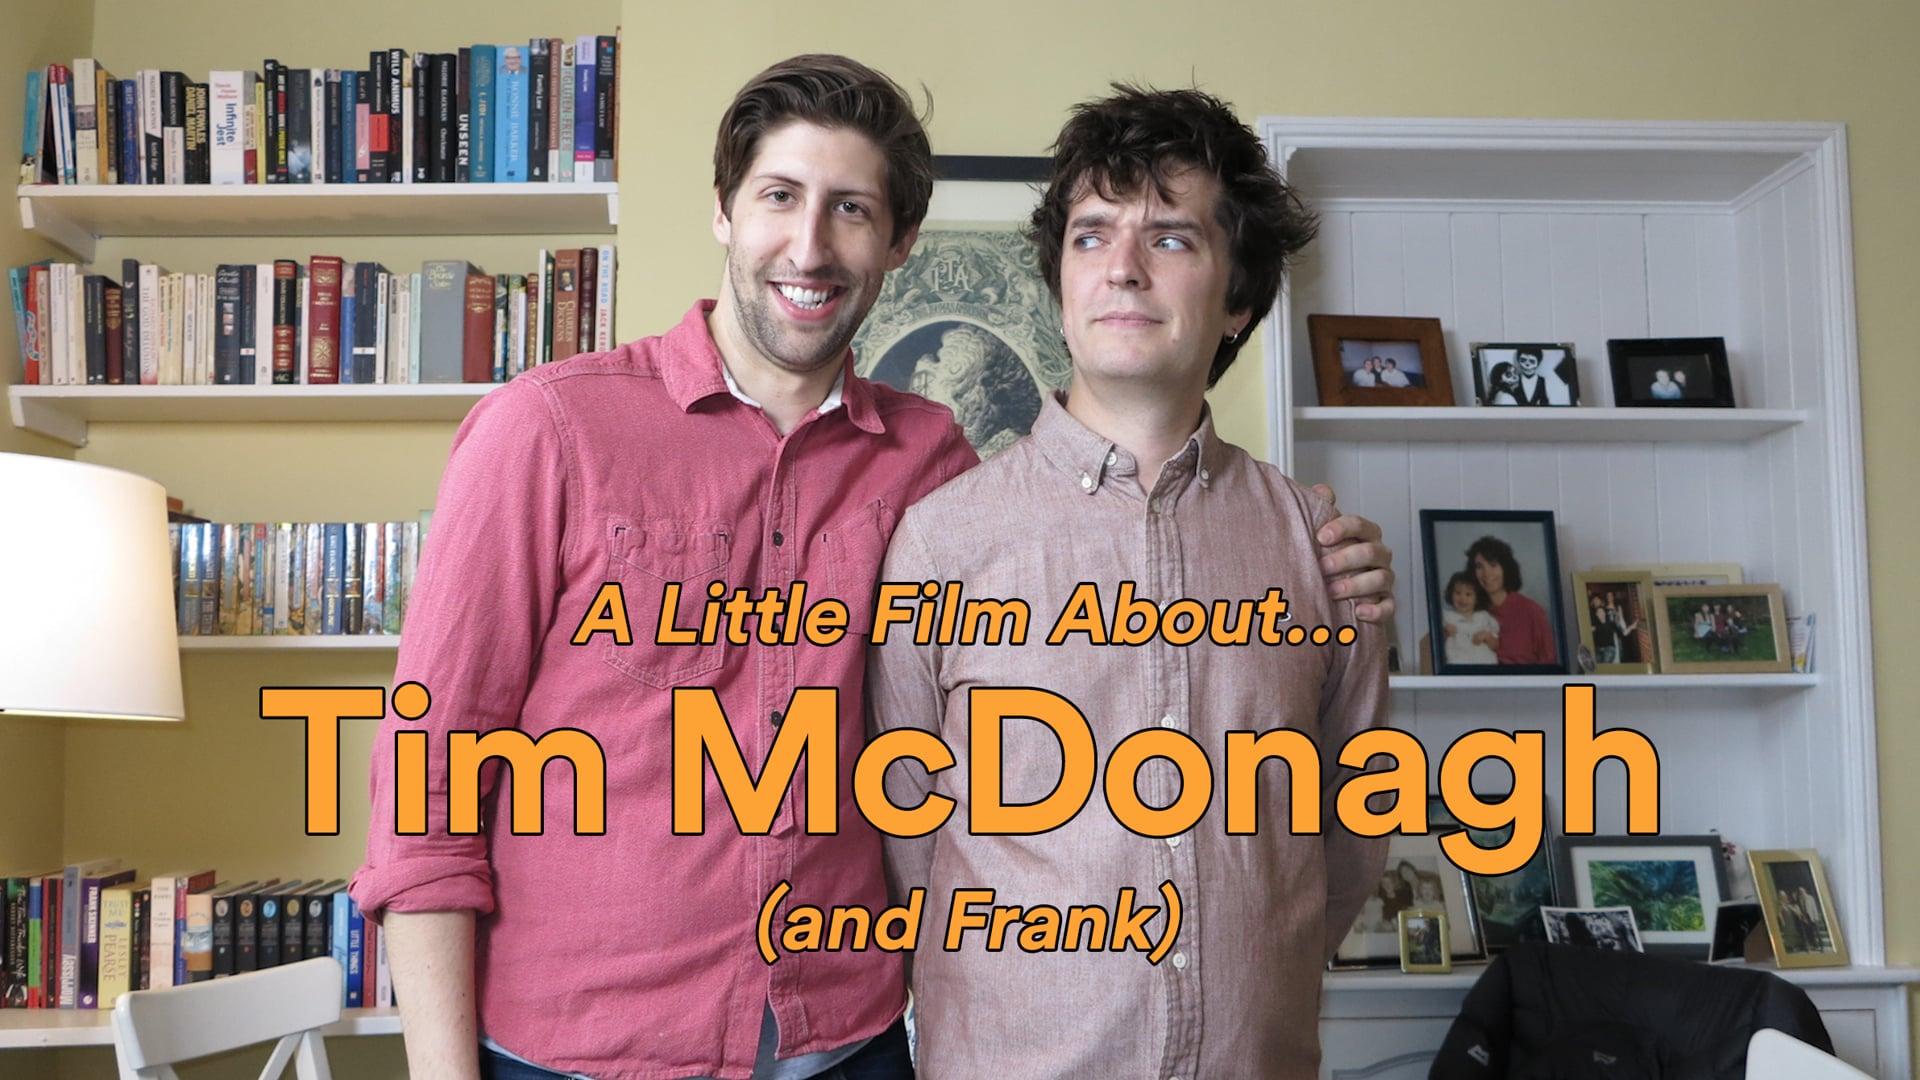 A Little Film About... Tim McDonagh